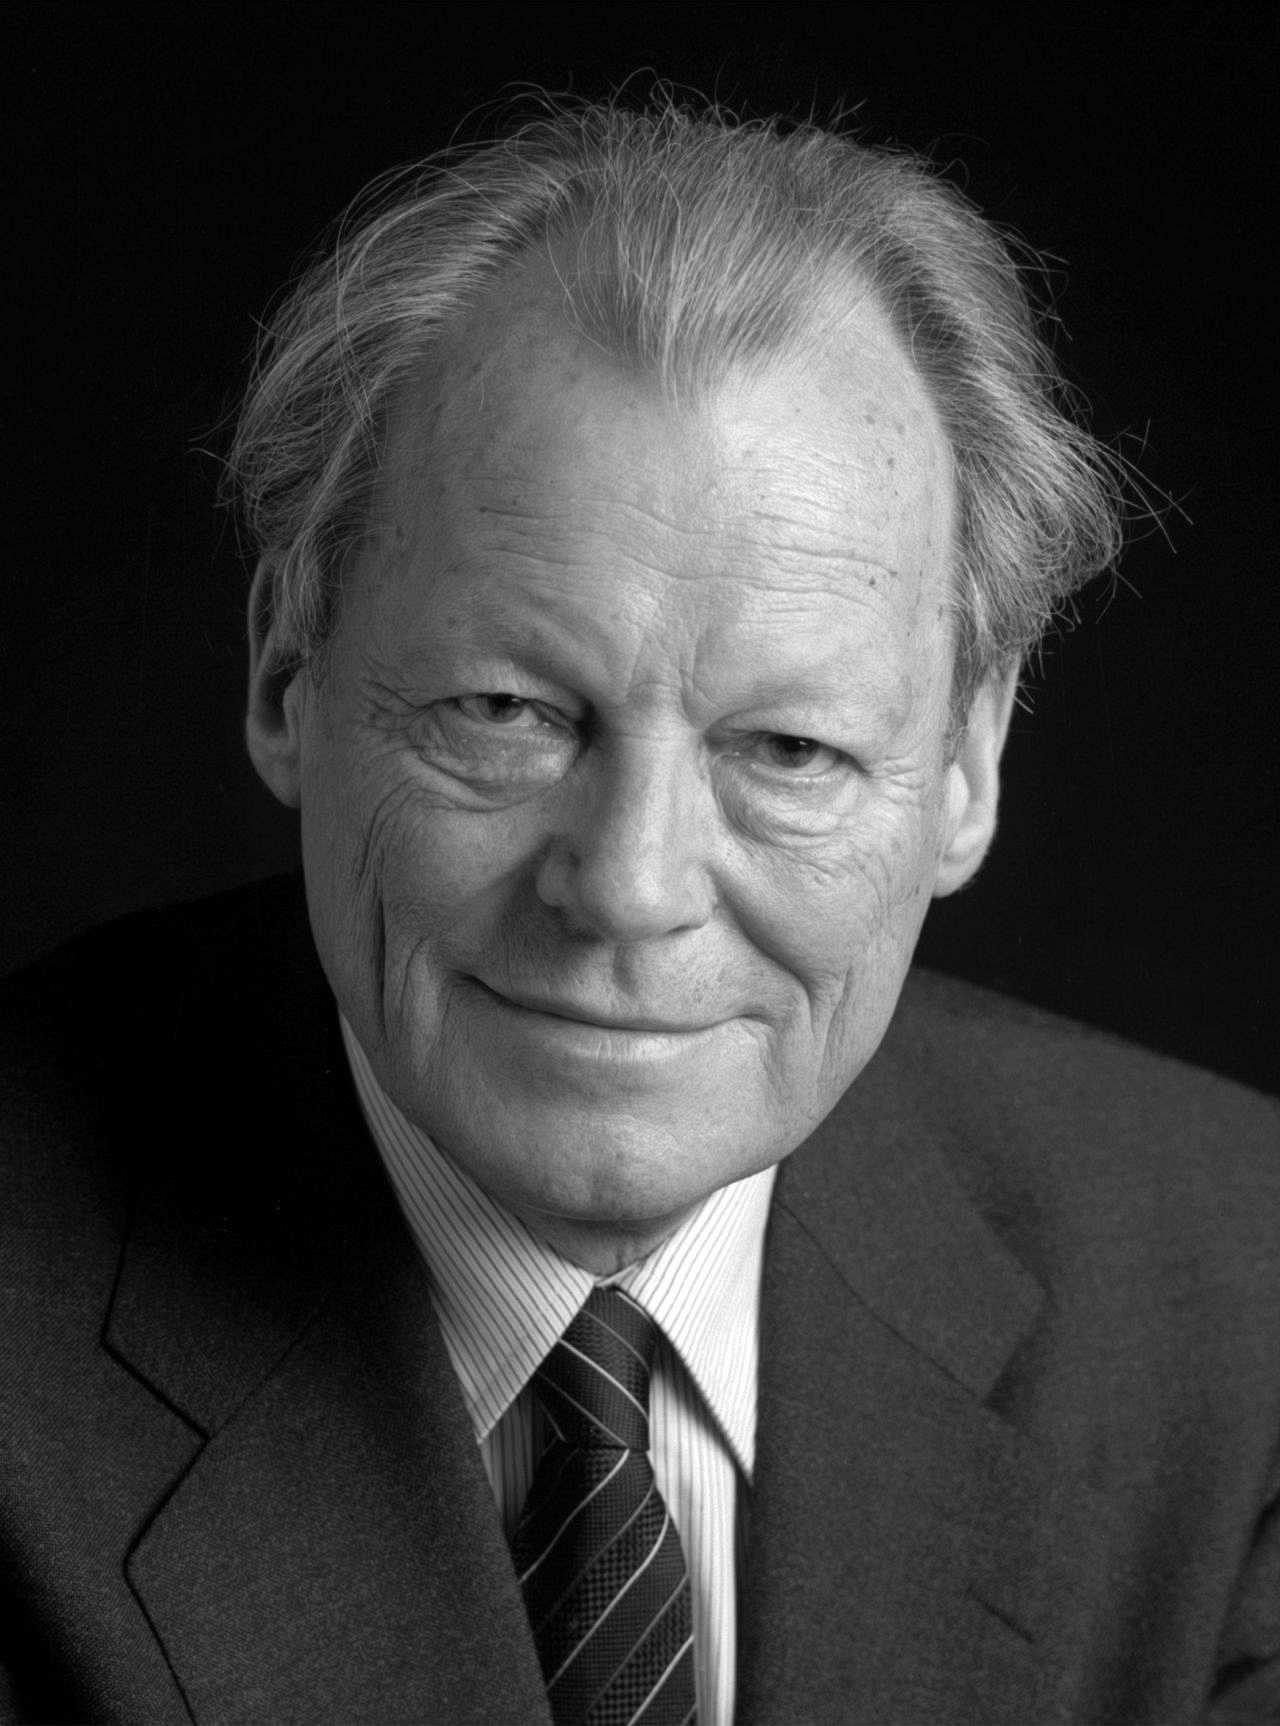 LeMO Biografie Willy Brandt